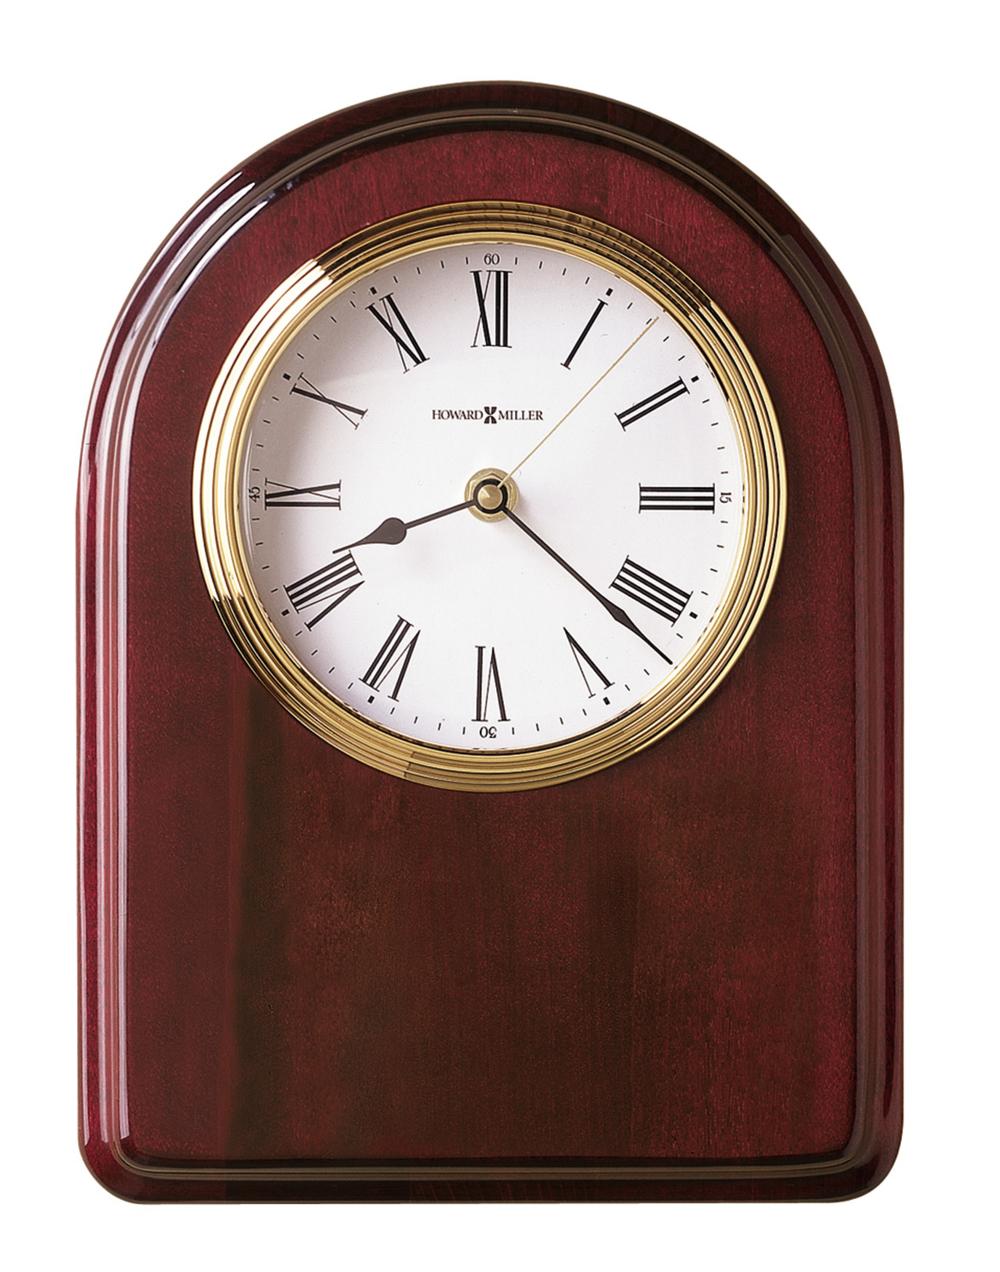 Howard Miller Clock - Honor Time IV Wall Clock